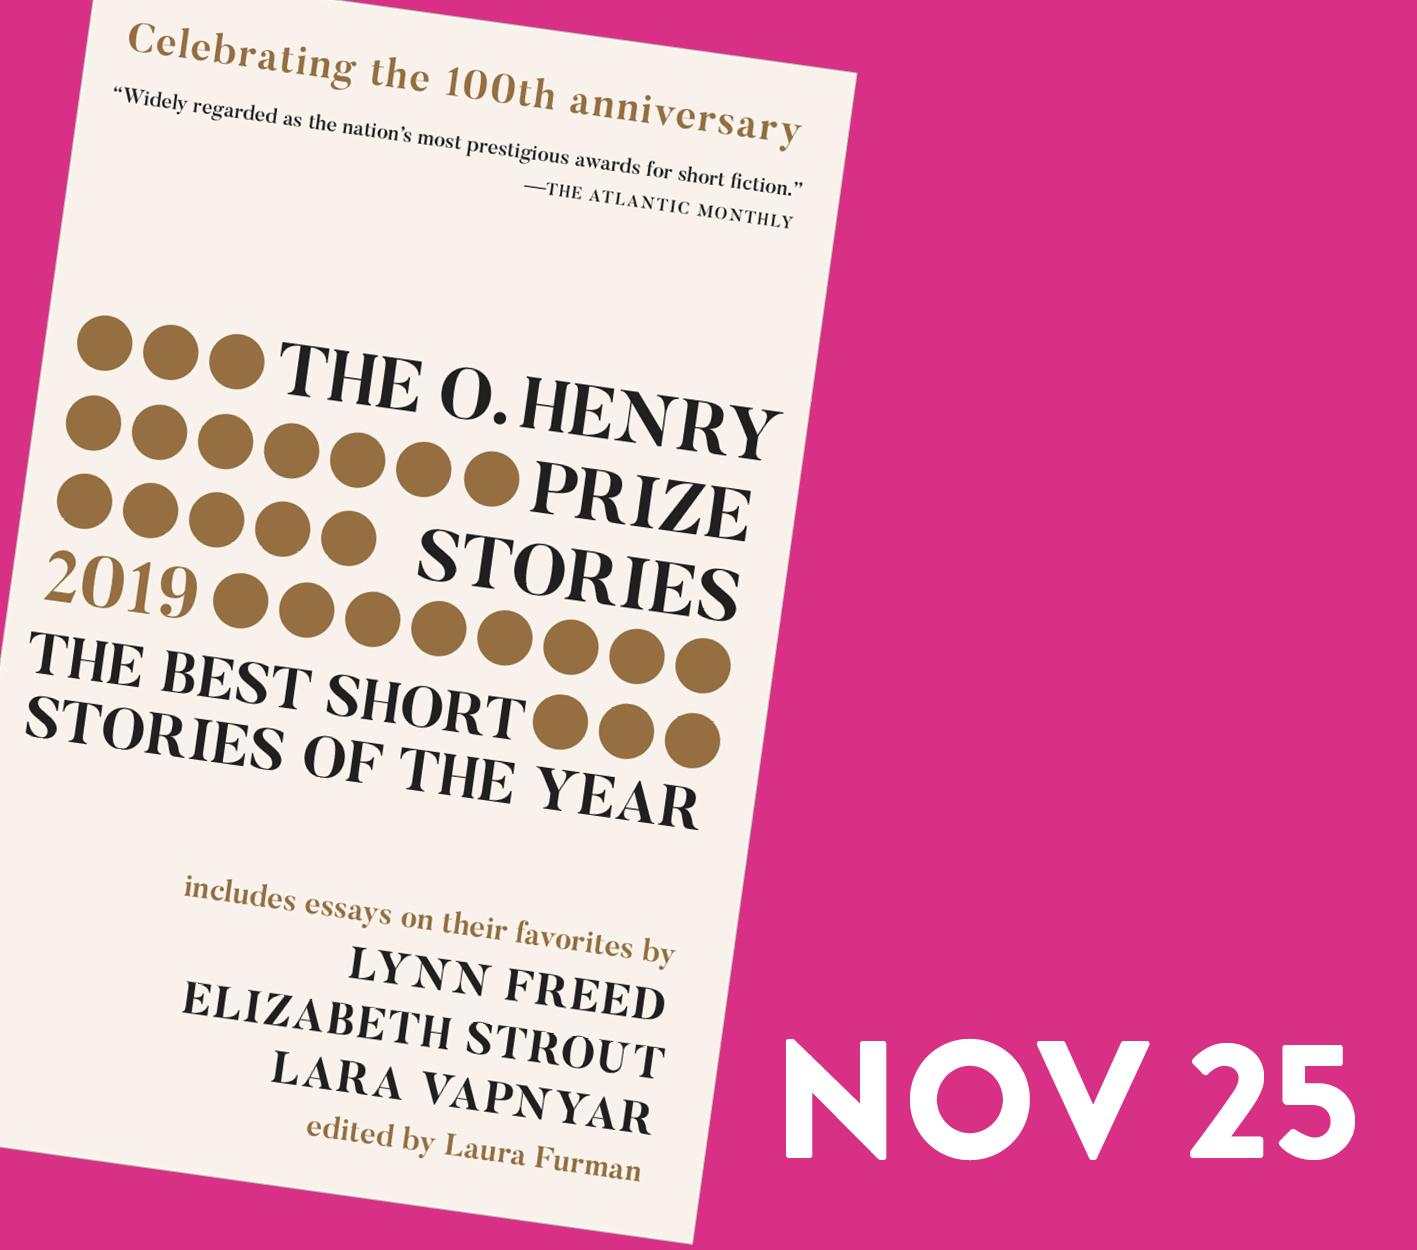 Image for Selected Shorts: O. Henry Prize at 100 with Chimamanda Ngozi Adichie